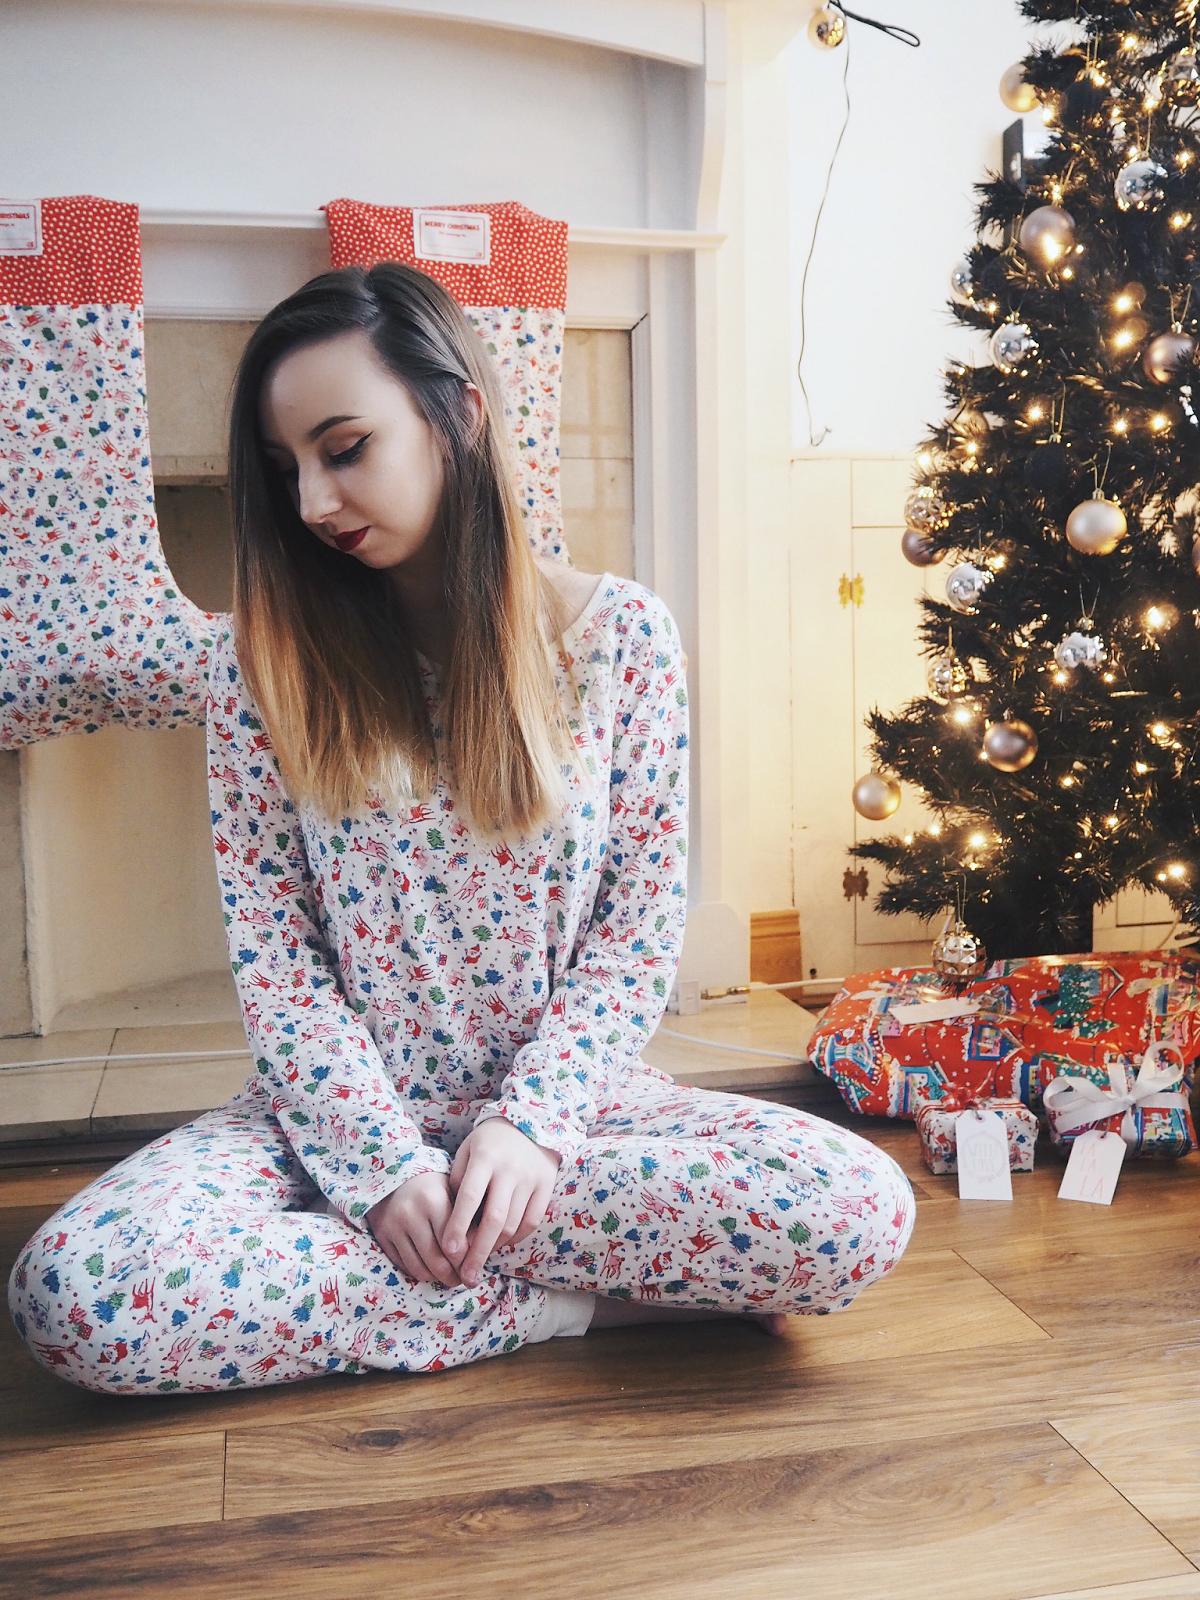 His 'n' Hers Christmas Pyjamas